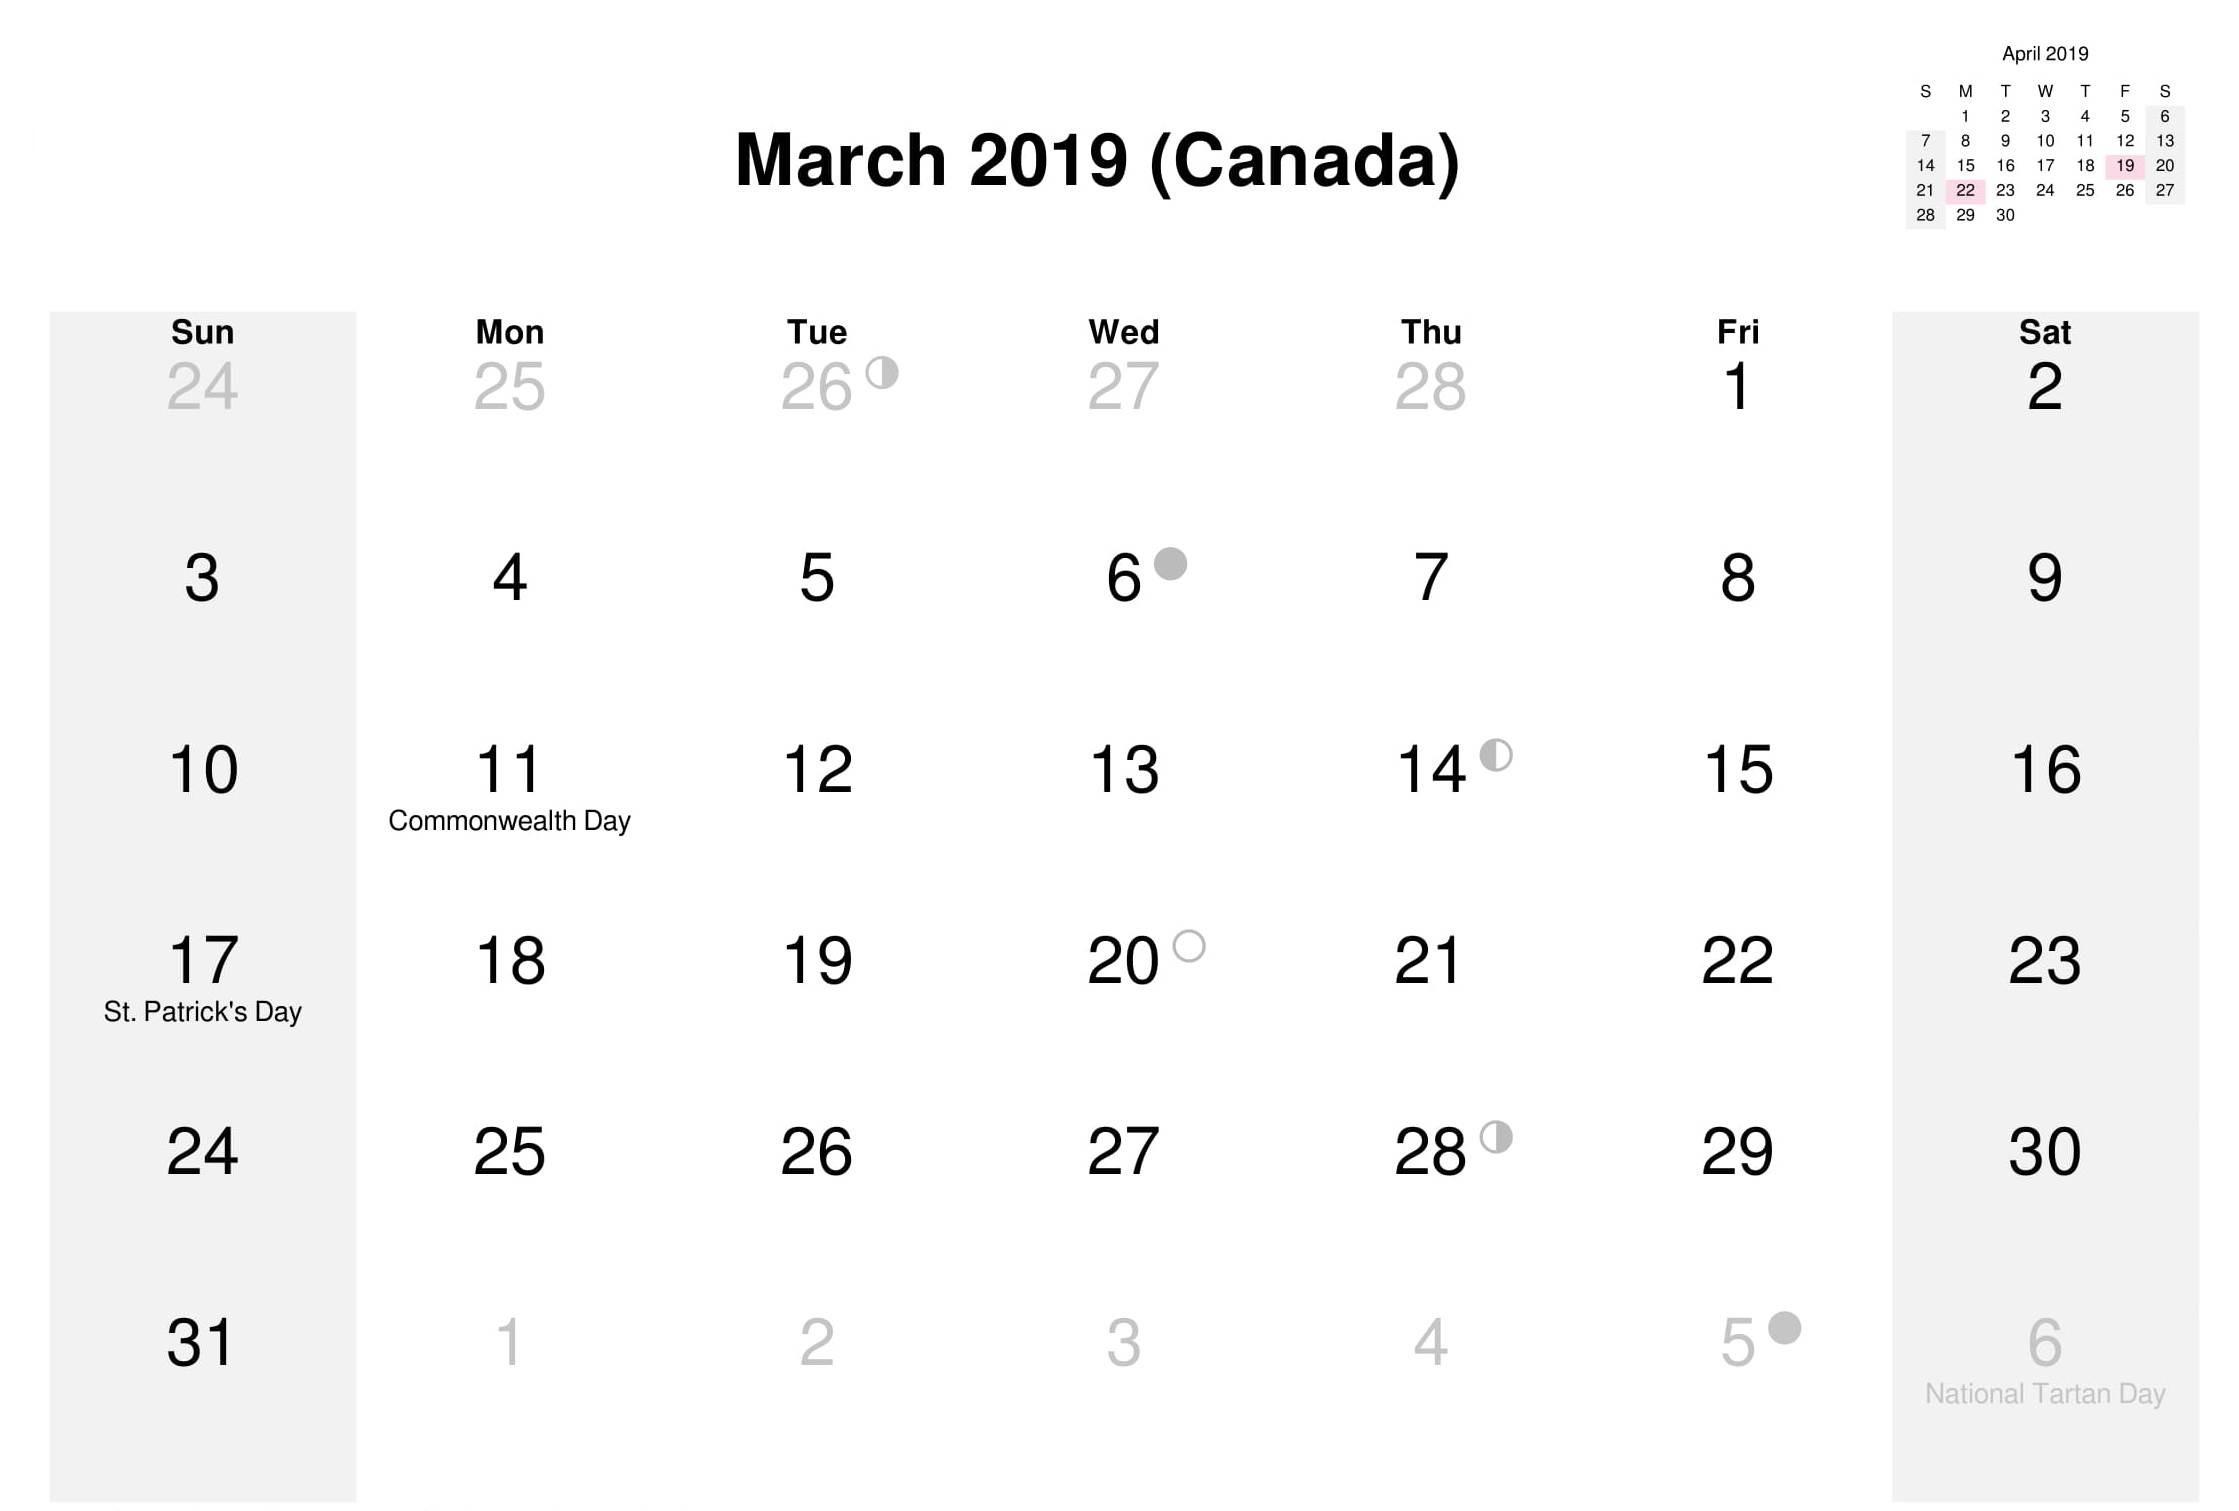 March Holiday Calendar 2019 Más Recientes March 2019 Calendar with Holidays Us Uk Canada Australia India Of March Holiday Calendar 2019 Más Caliente Printable March 2019 Calendar Template Holidays Yes Calendars